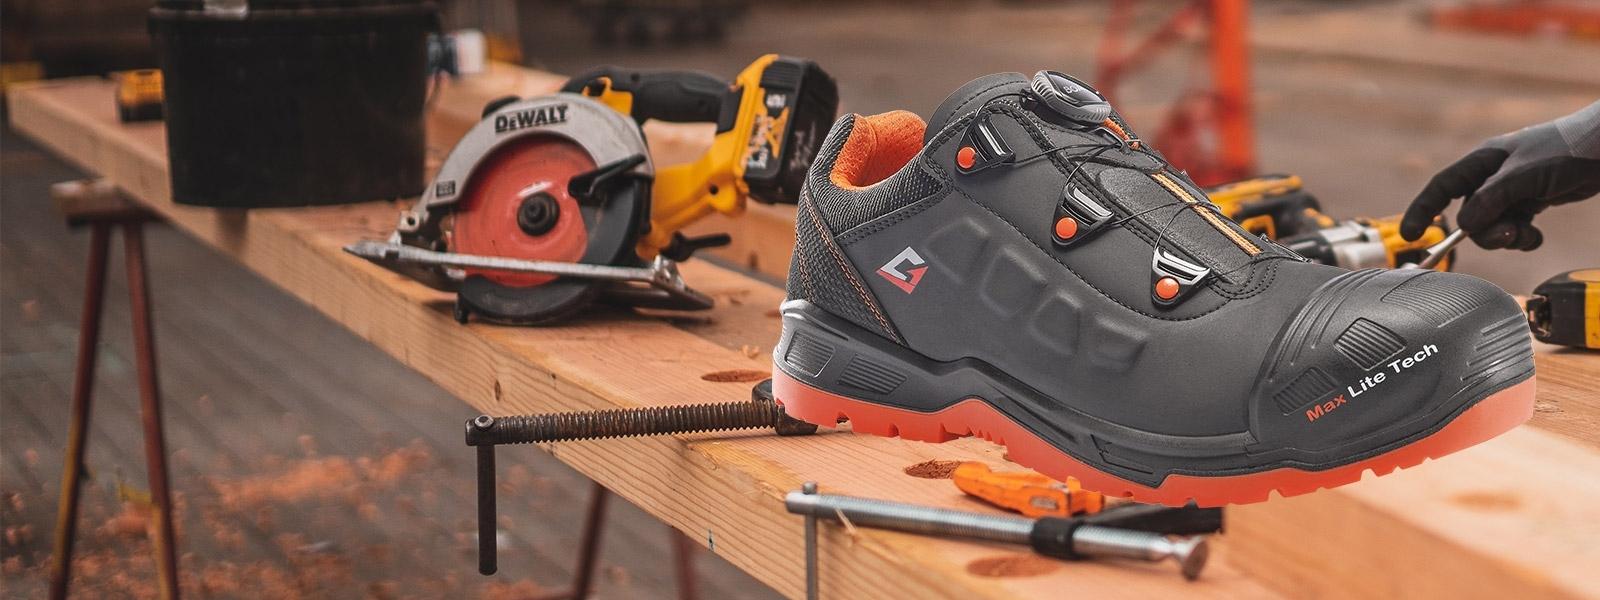 Garsport scarpe antinfortunistiche S3 con puntale full protection line